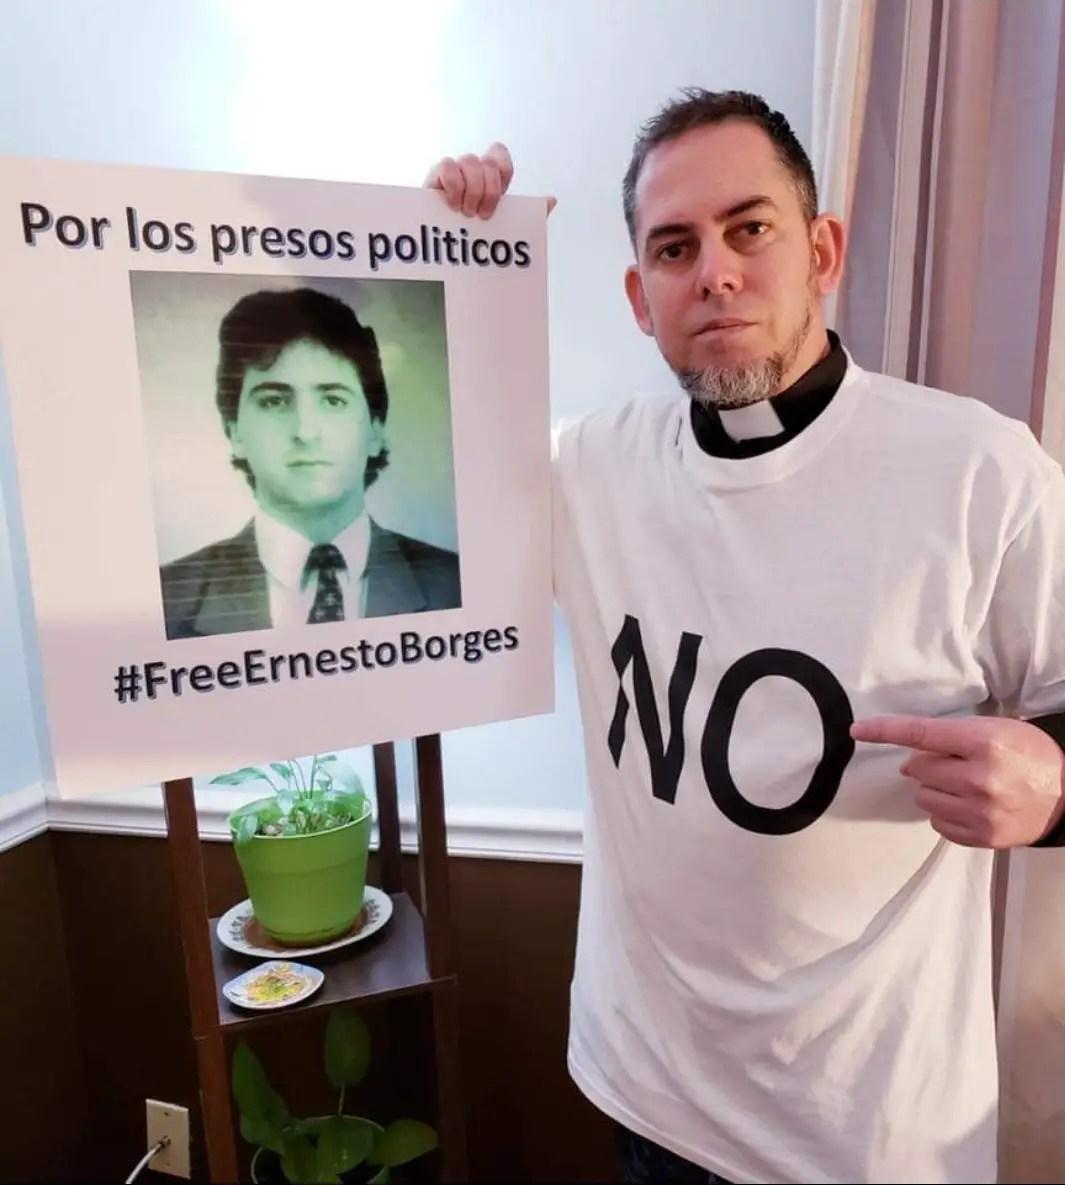 Instituto Patmos, libertad religiosa, Mario Félix Lleonart, Cuba